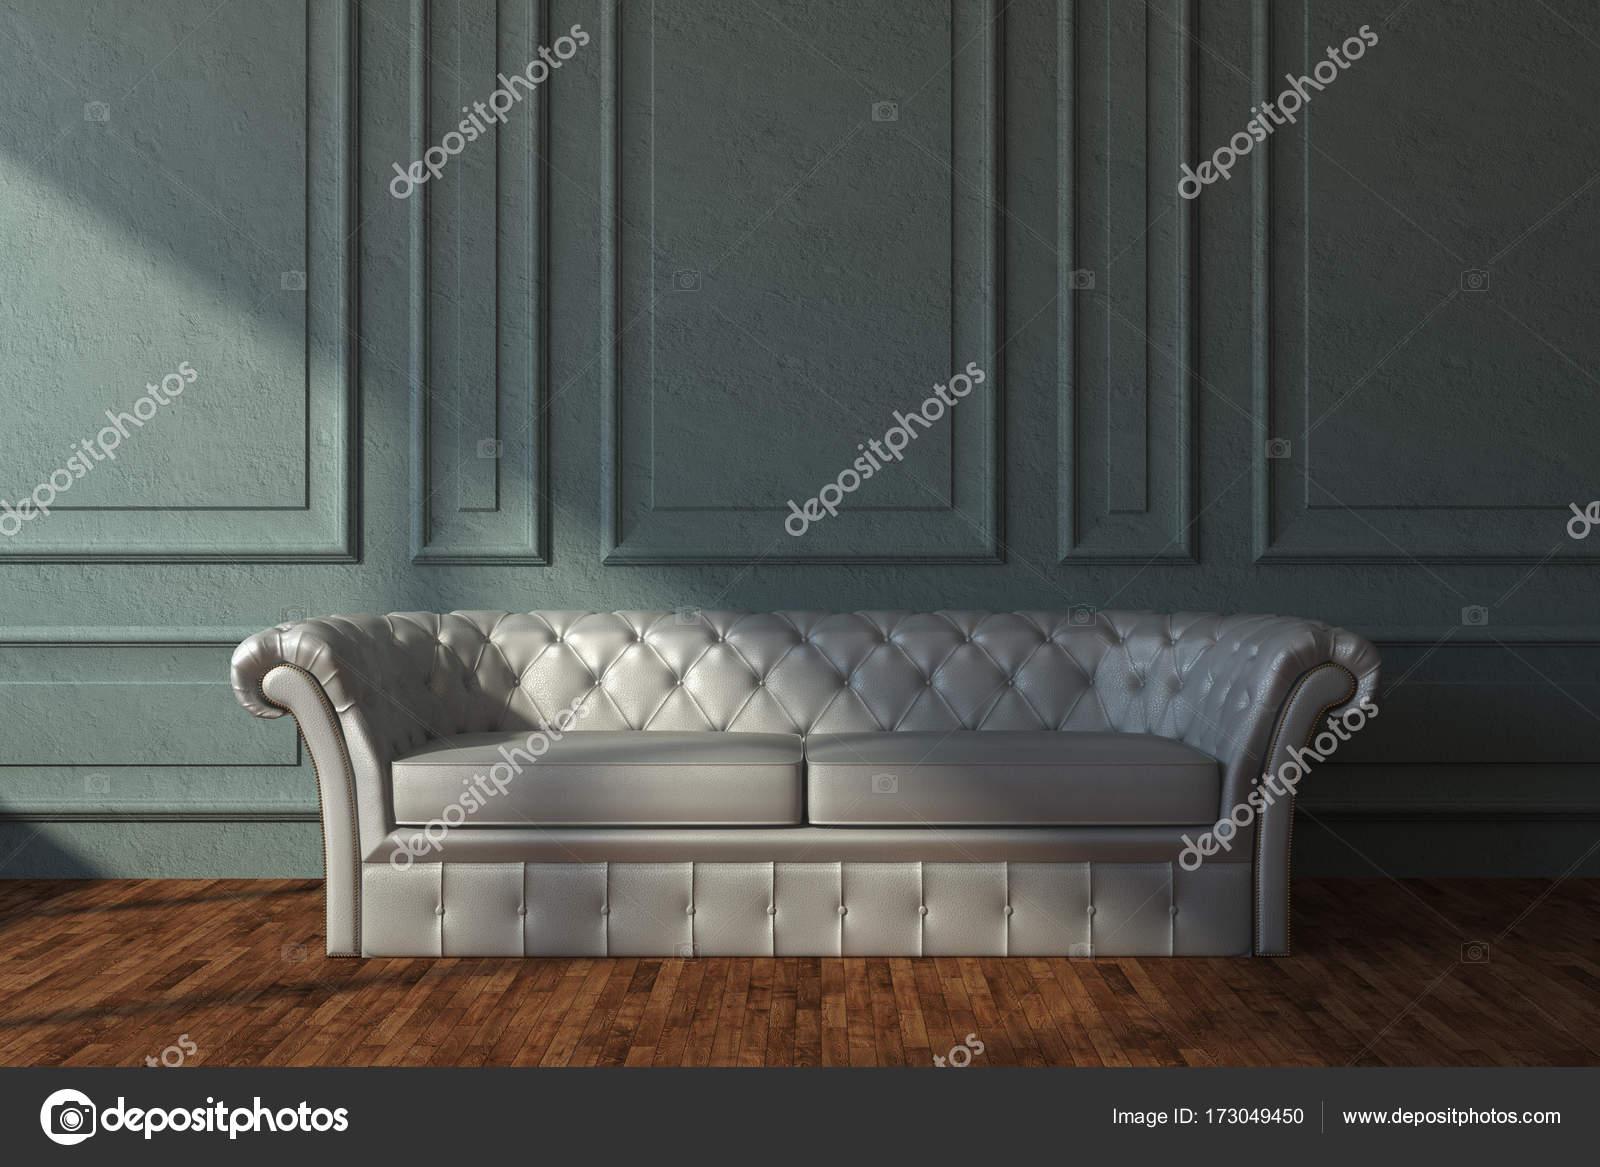 Wondrous Beige Leather Sofa In Classic Room Stock Photo C Peshkova Squirreltailoven Fun Painted Chair Ideas Images Squirreltailovenorg